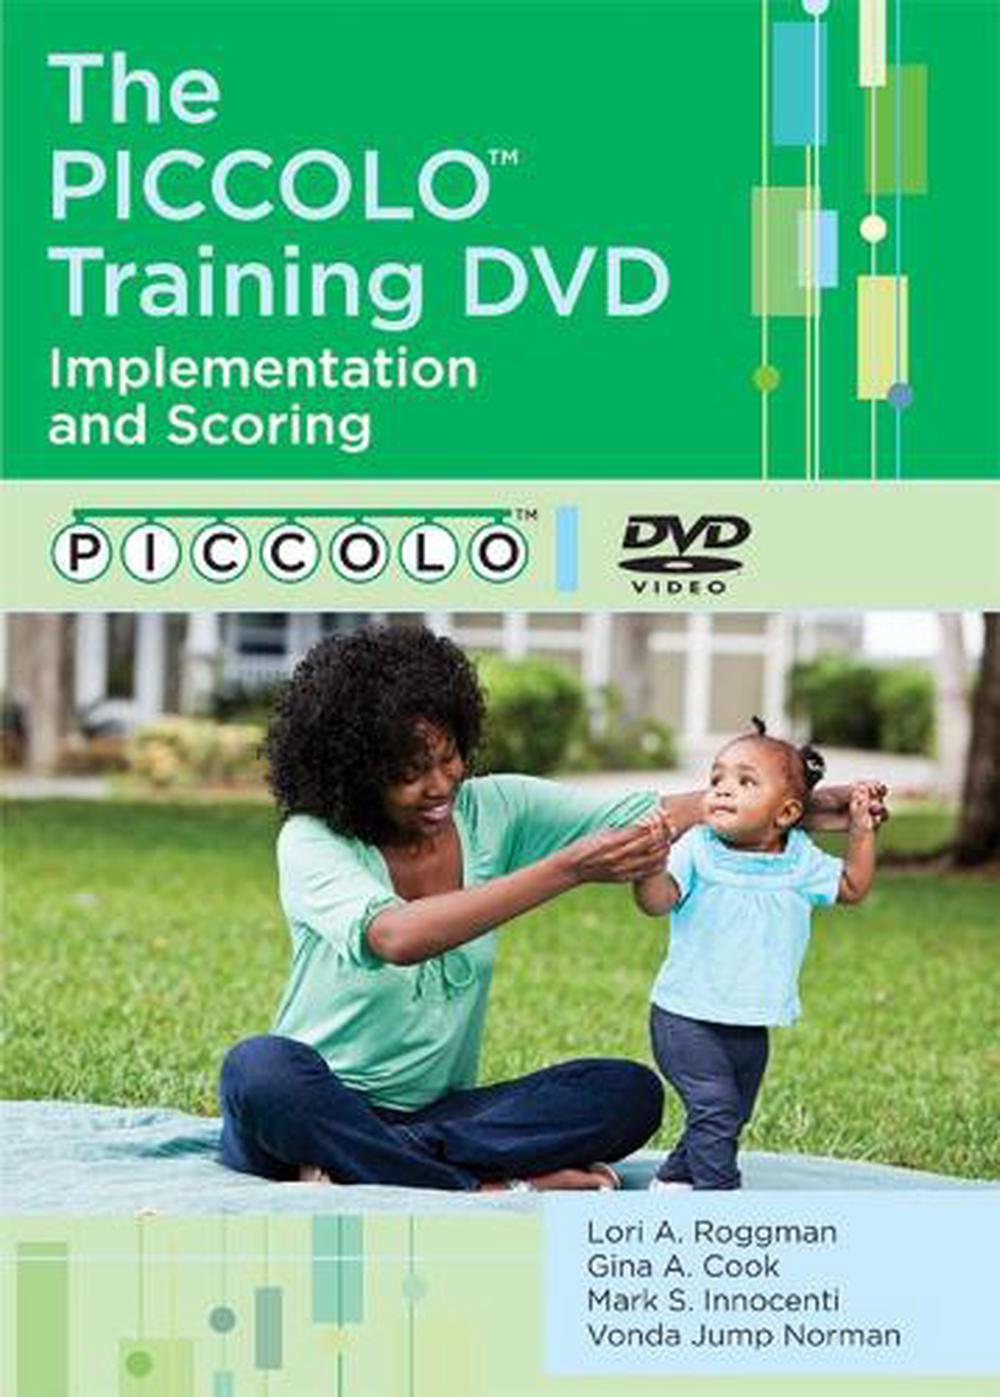 The PICCOLO (TM) Training DVD